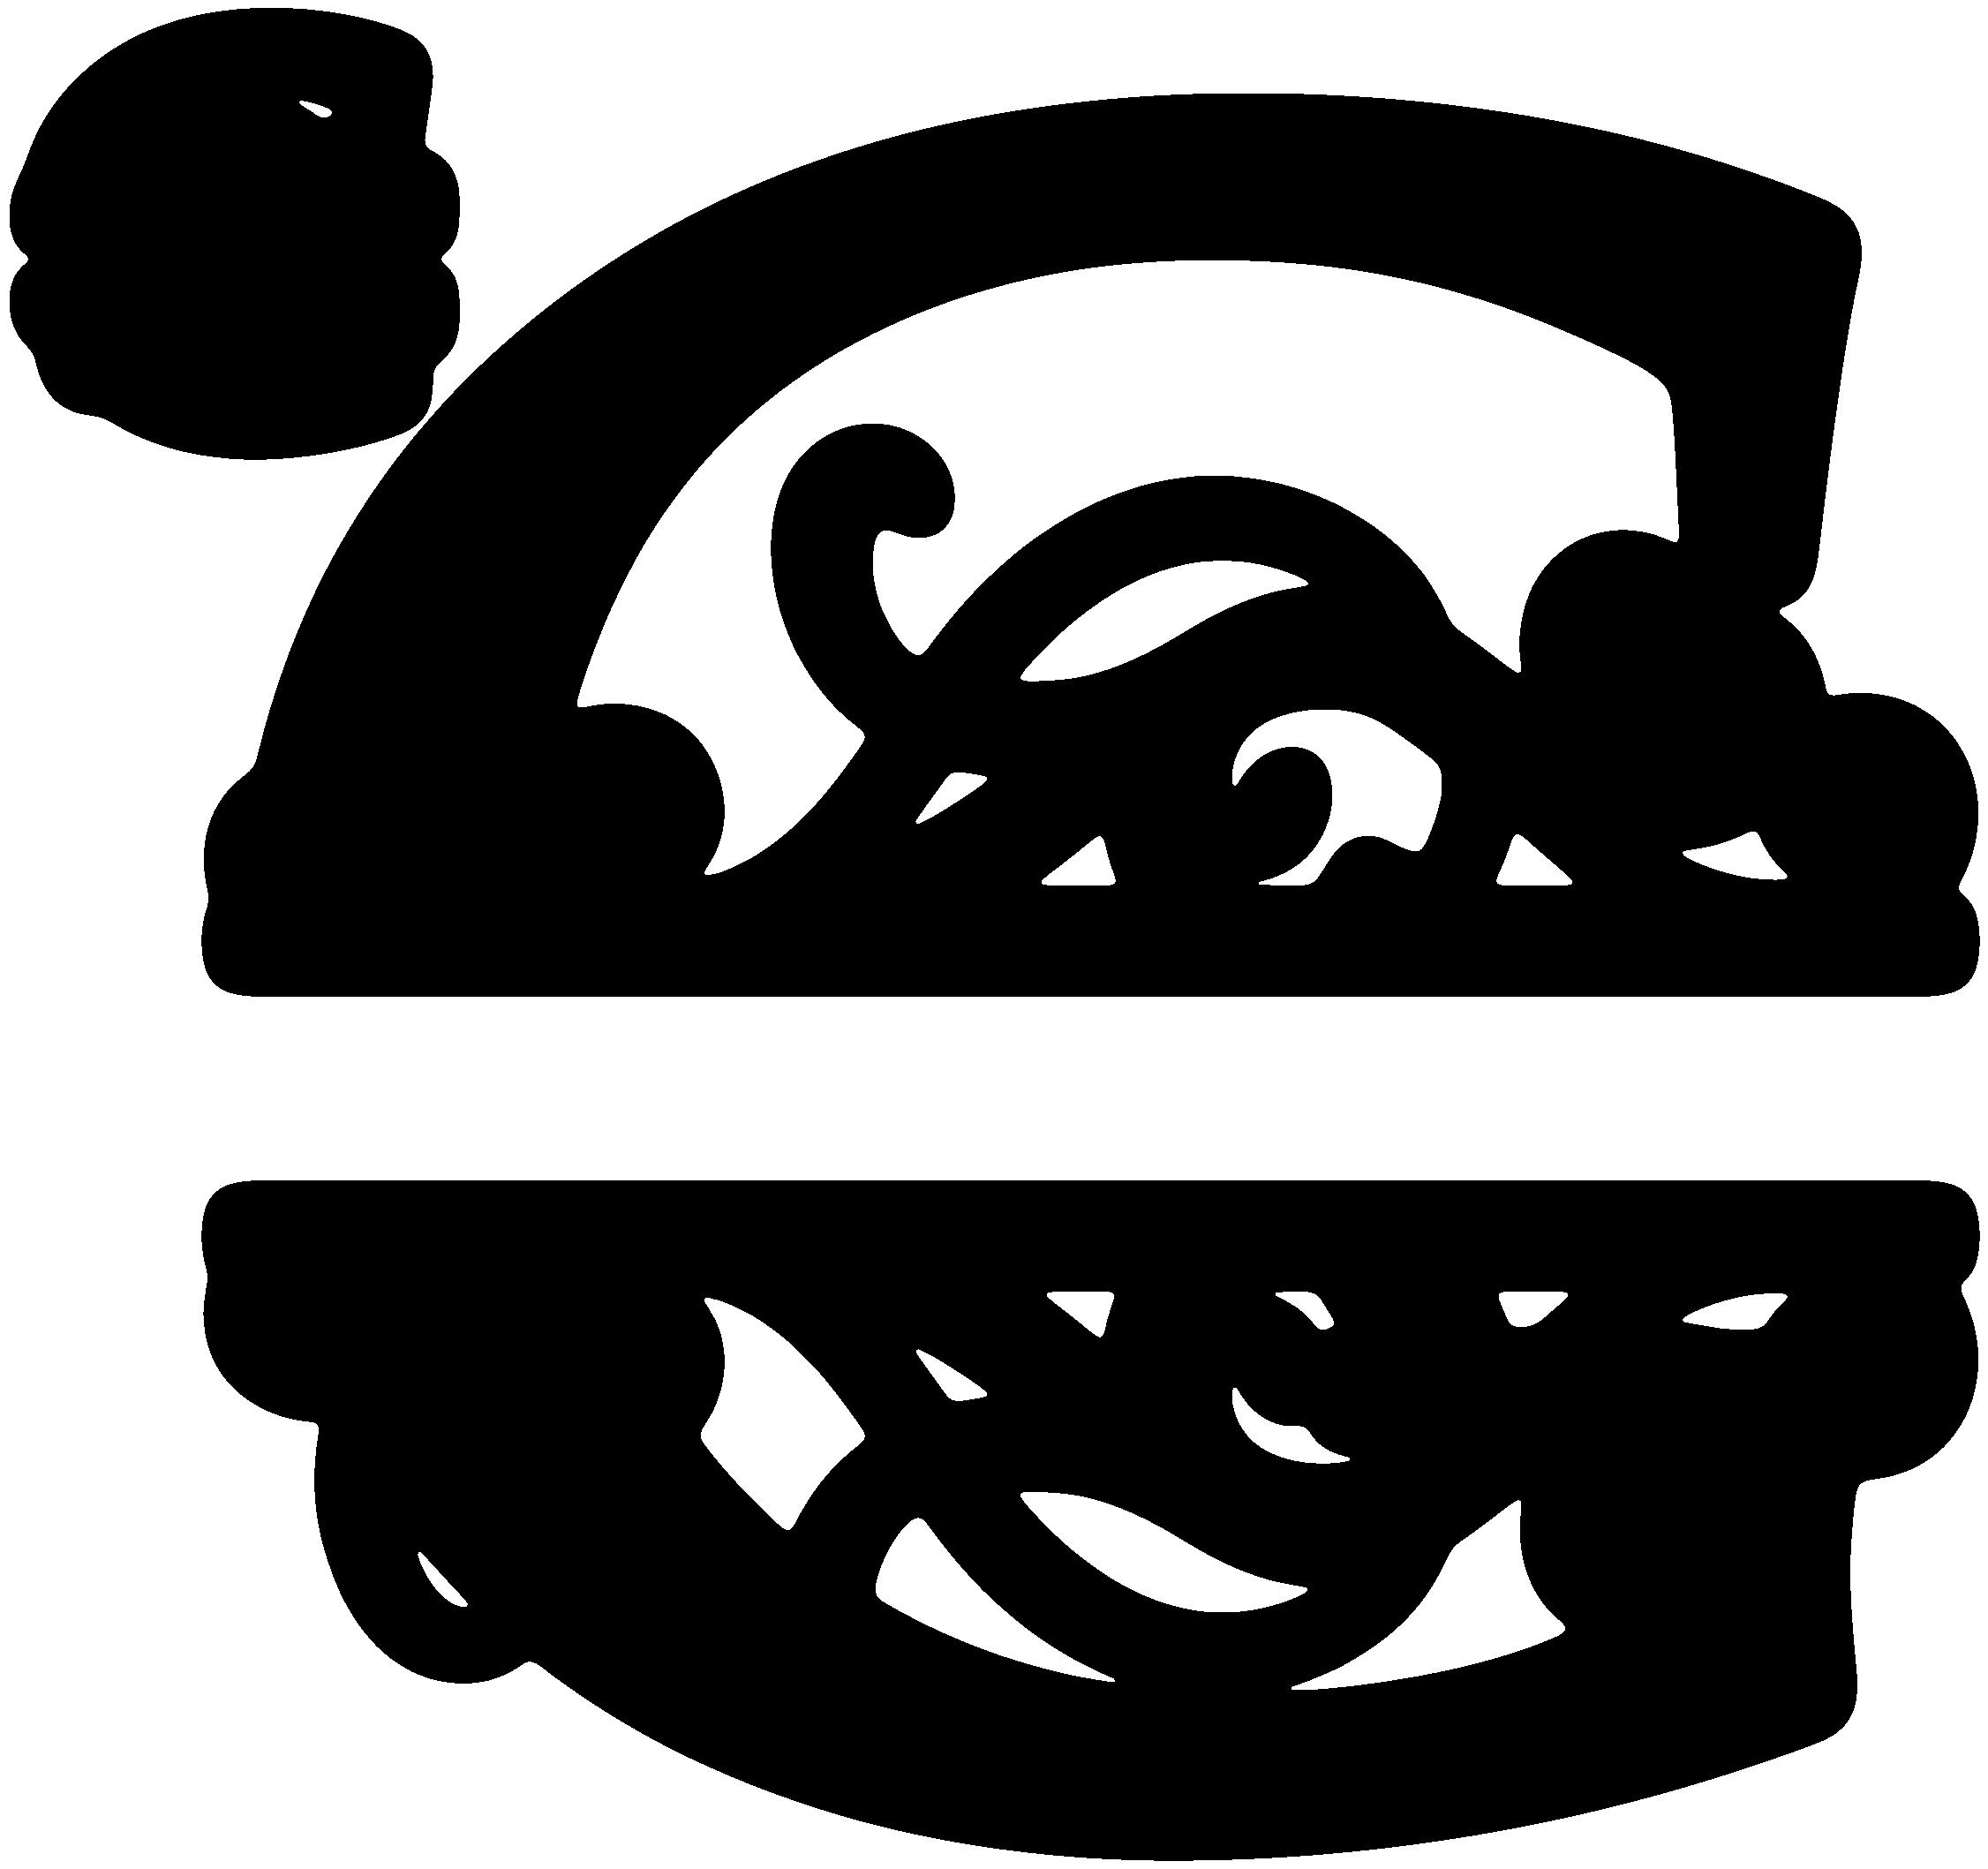 Quot G Quot Split Monogram Cricut Monogram Cricut Monogram Font